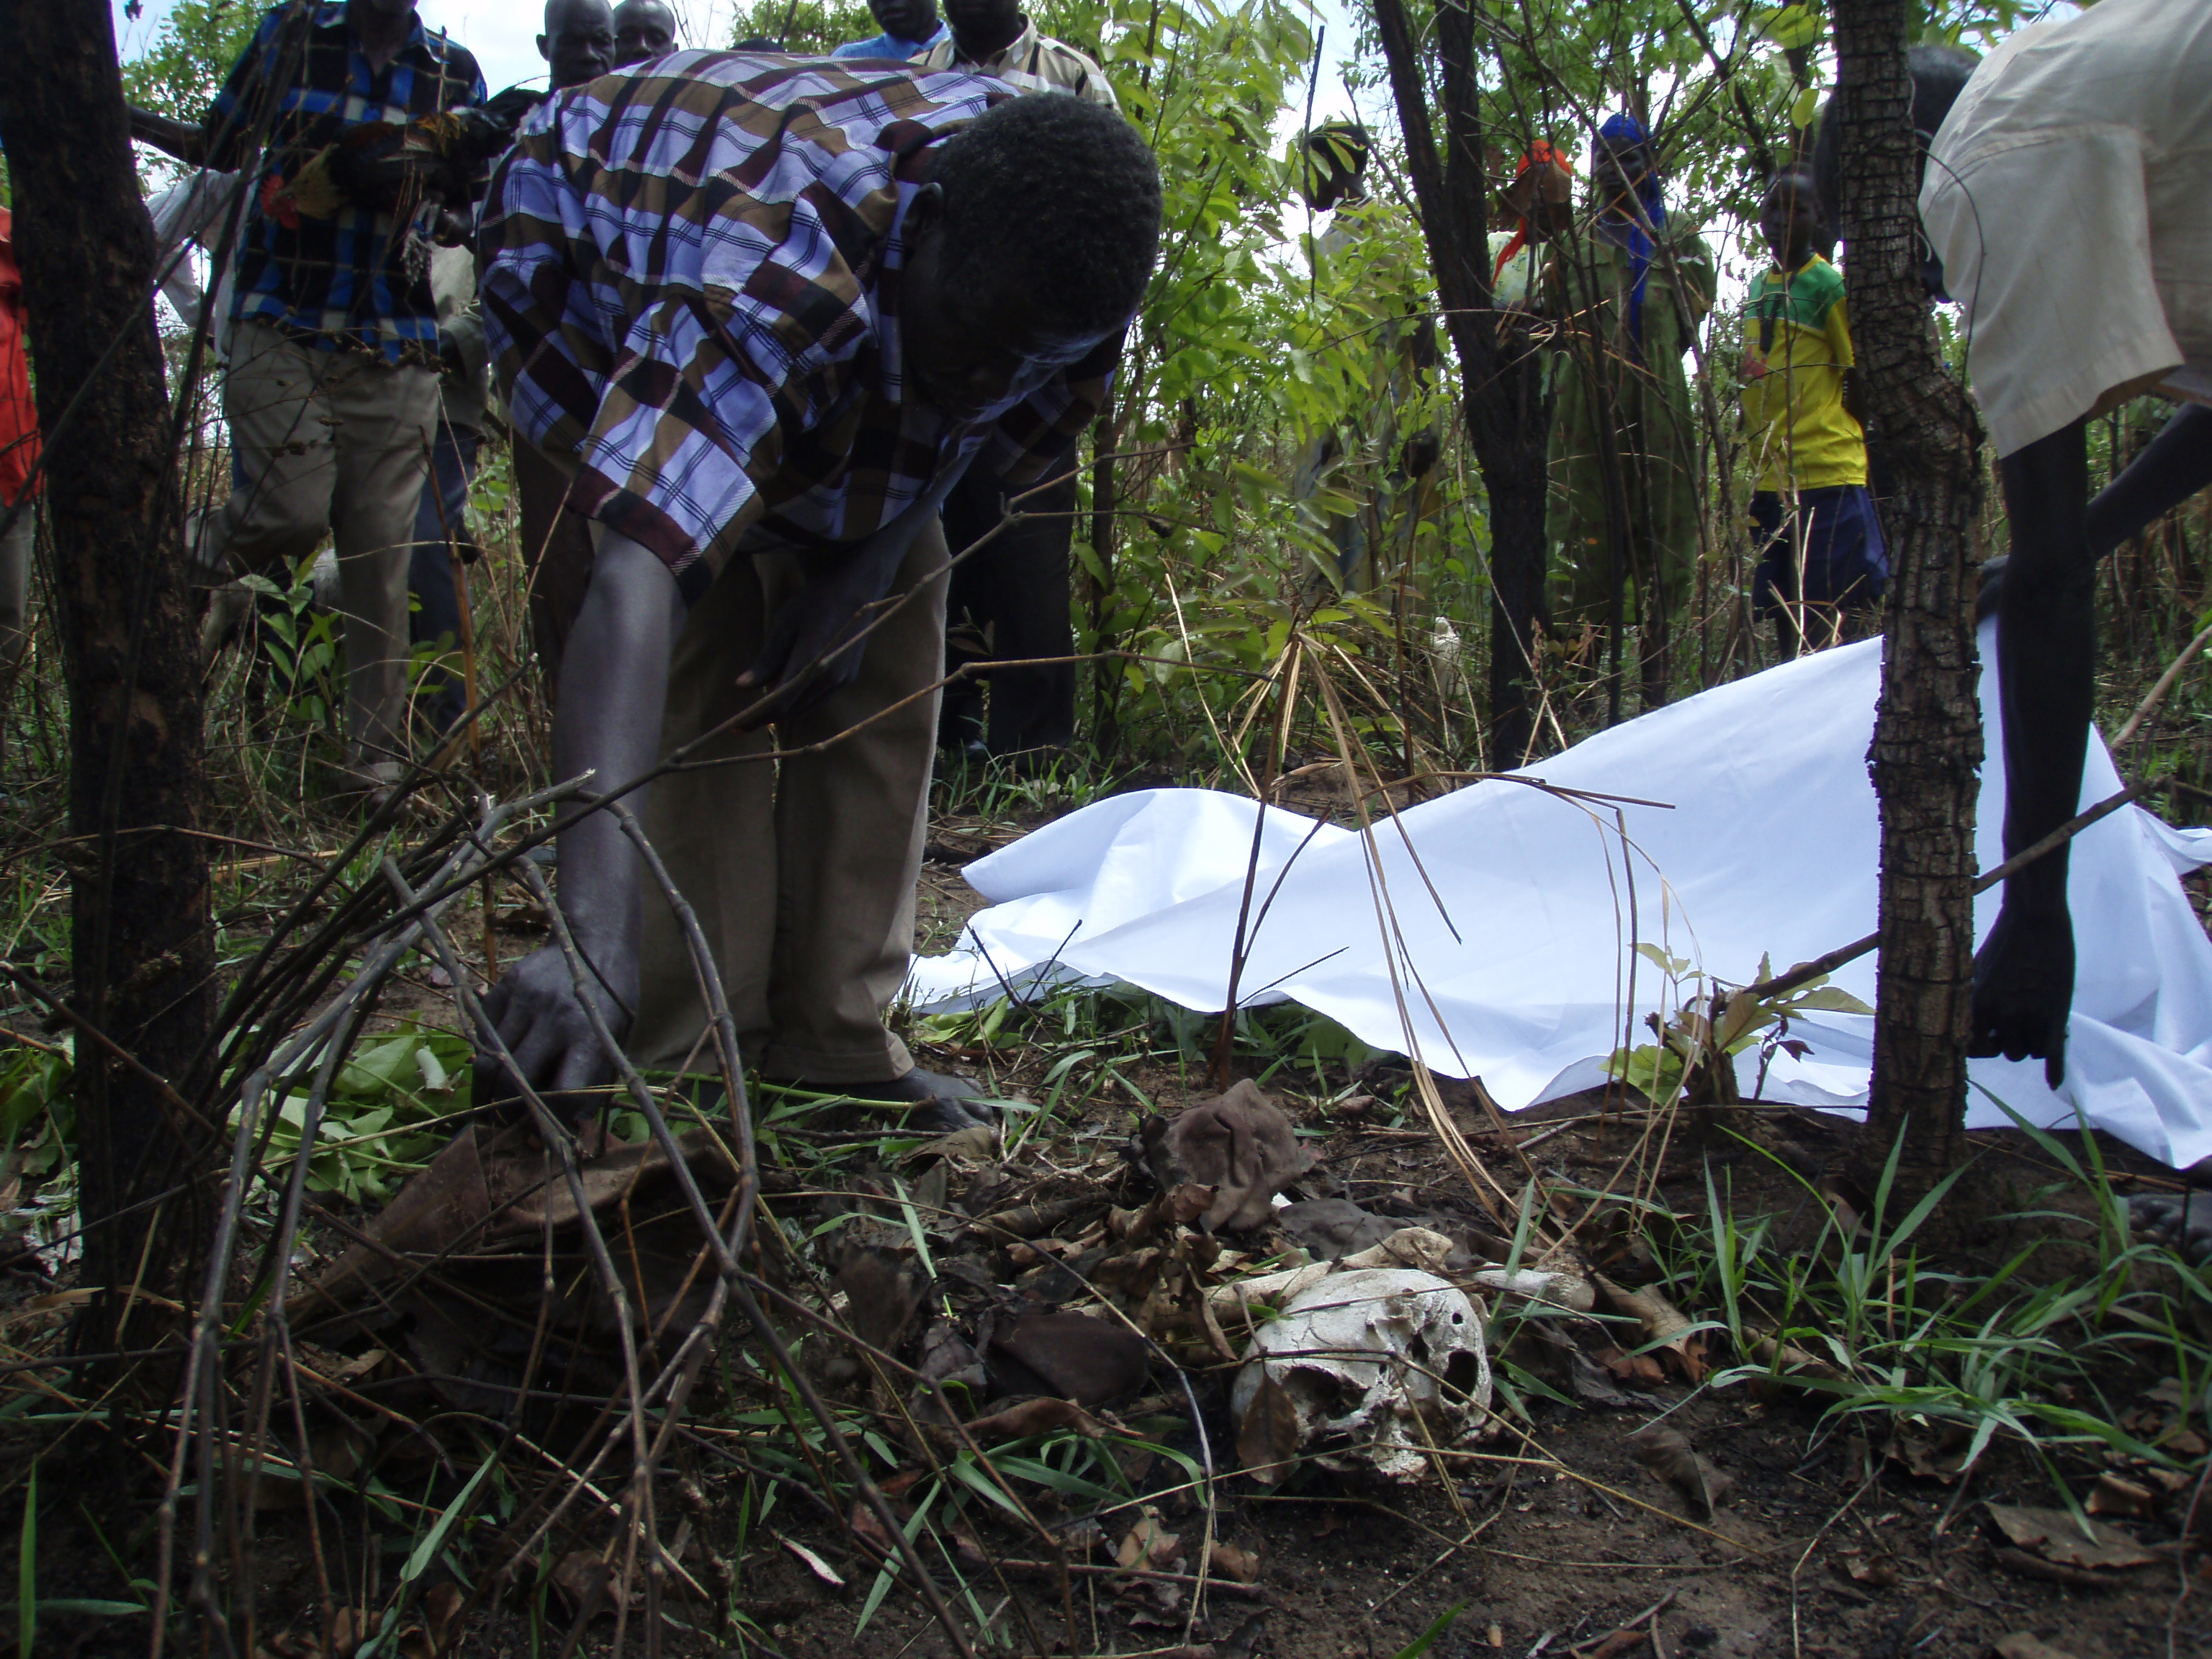 Elders in Odek Village, Gulu gather remains of people killed in the LRA war for reburrial. Rosebell Kagumire/2009